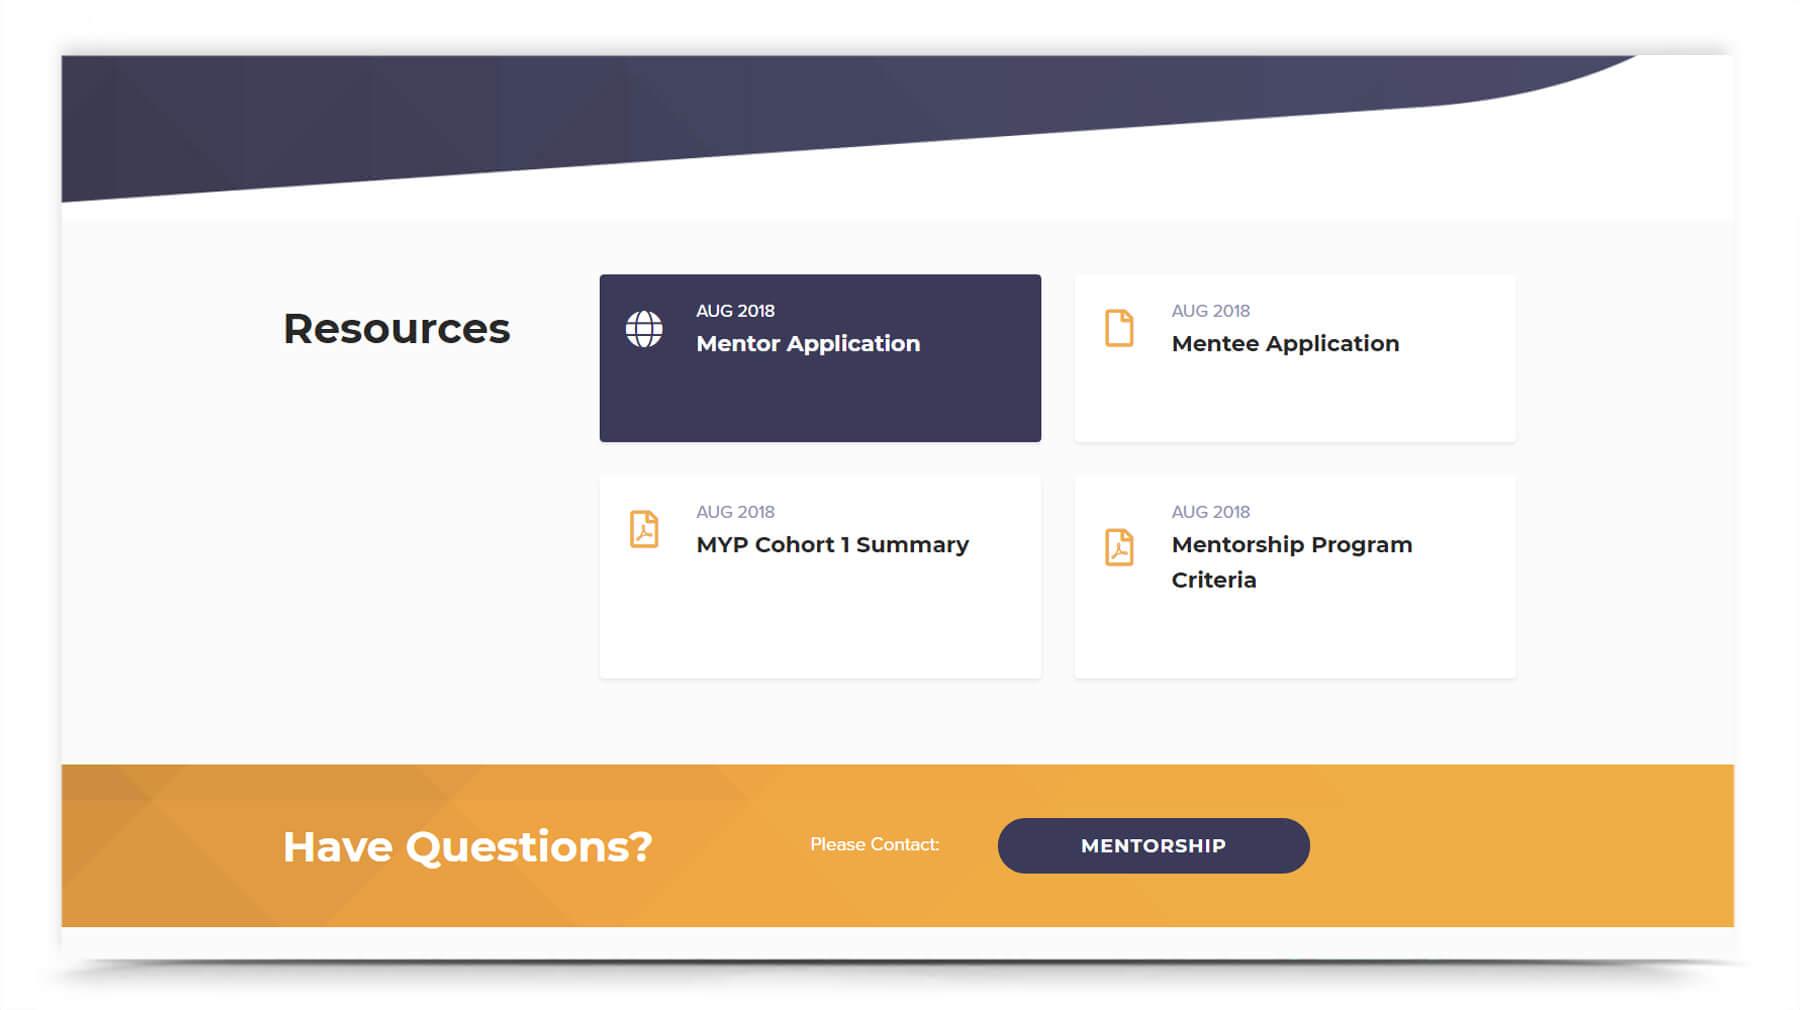 WIMWIN-Resources1.jpg